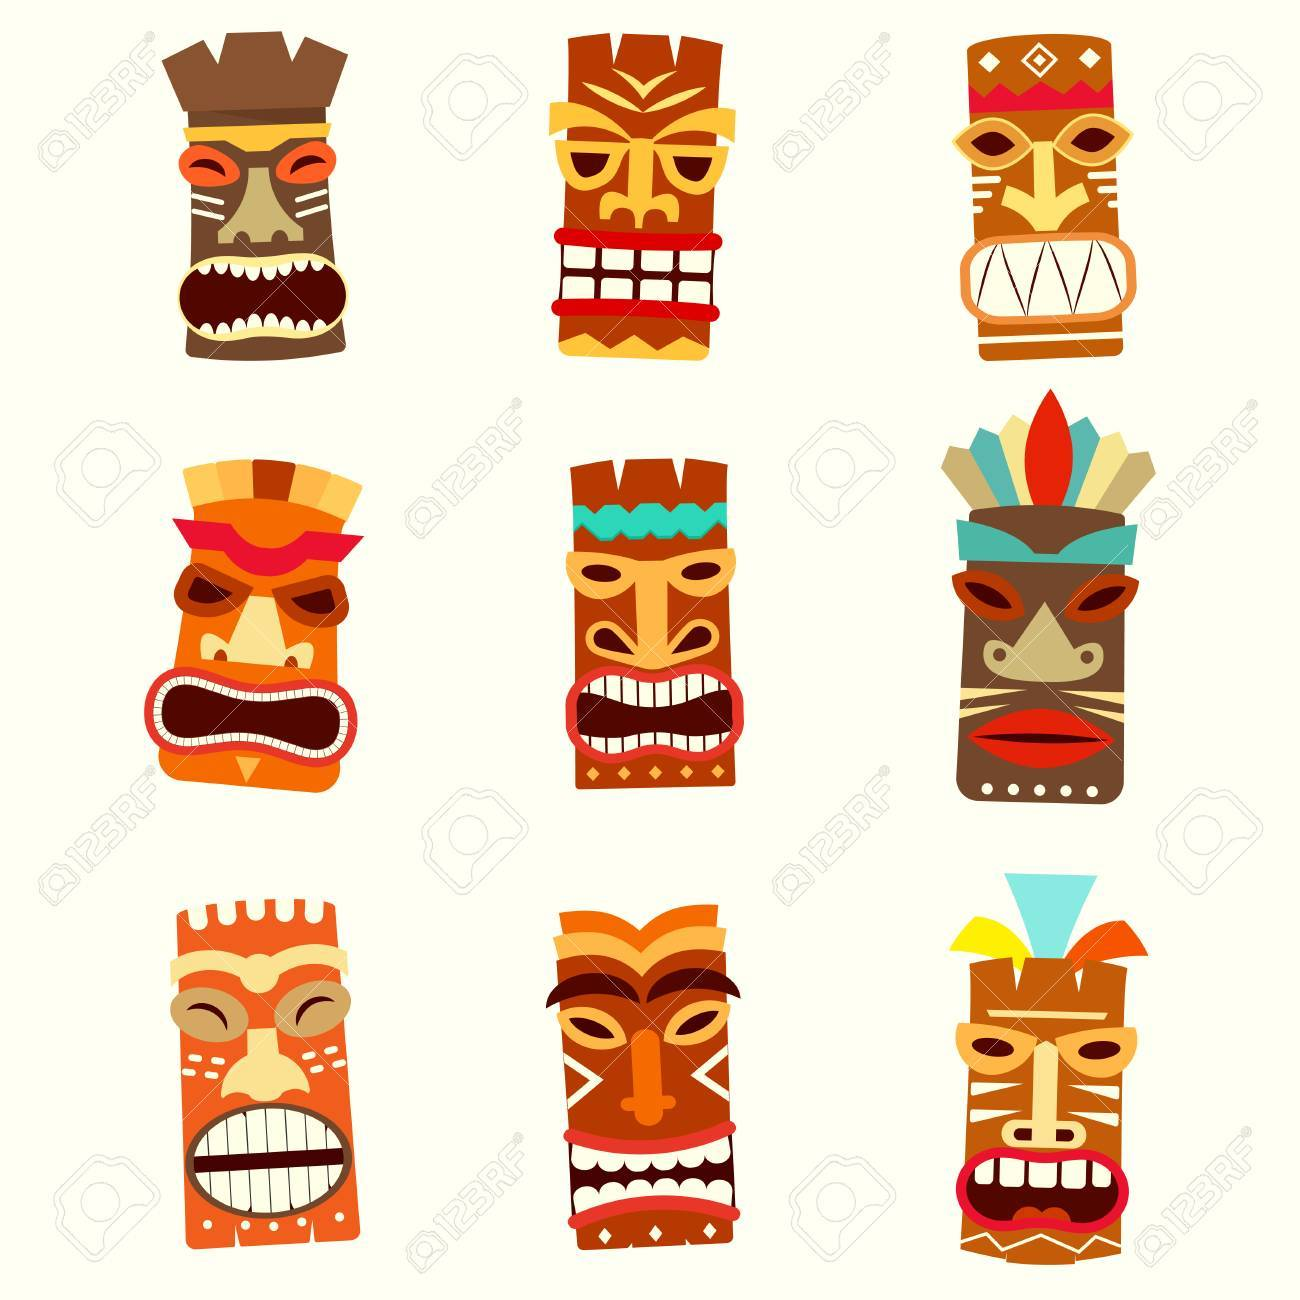 Tiki mask icon set royalty free cliparts vectors and stock tiki mask icon set stock vector 86990228 stopboris Images